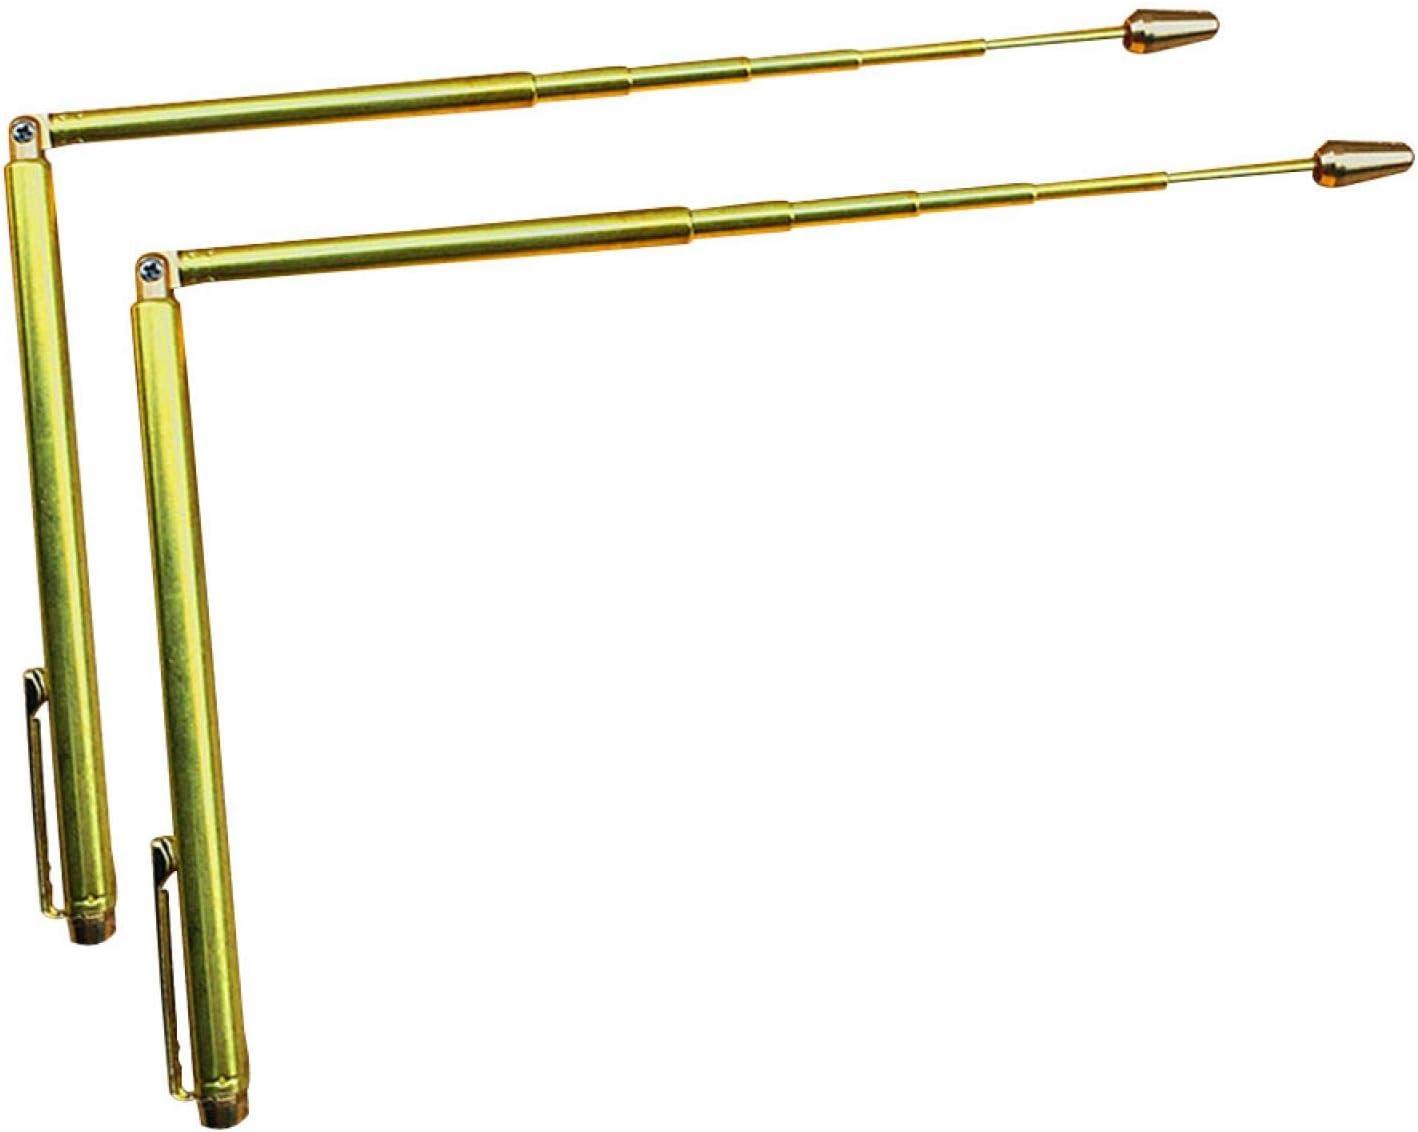 2pcs Brass trend rank Dowsing Rods Divining Traci High quality new Treasure for Seeking